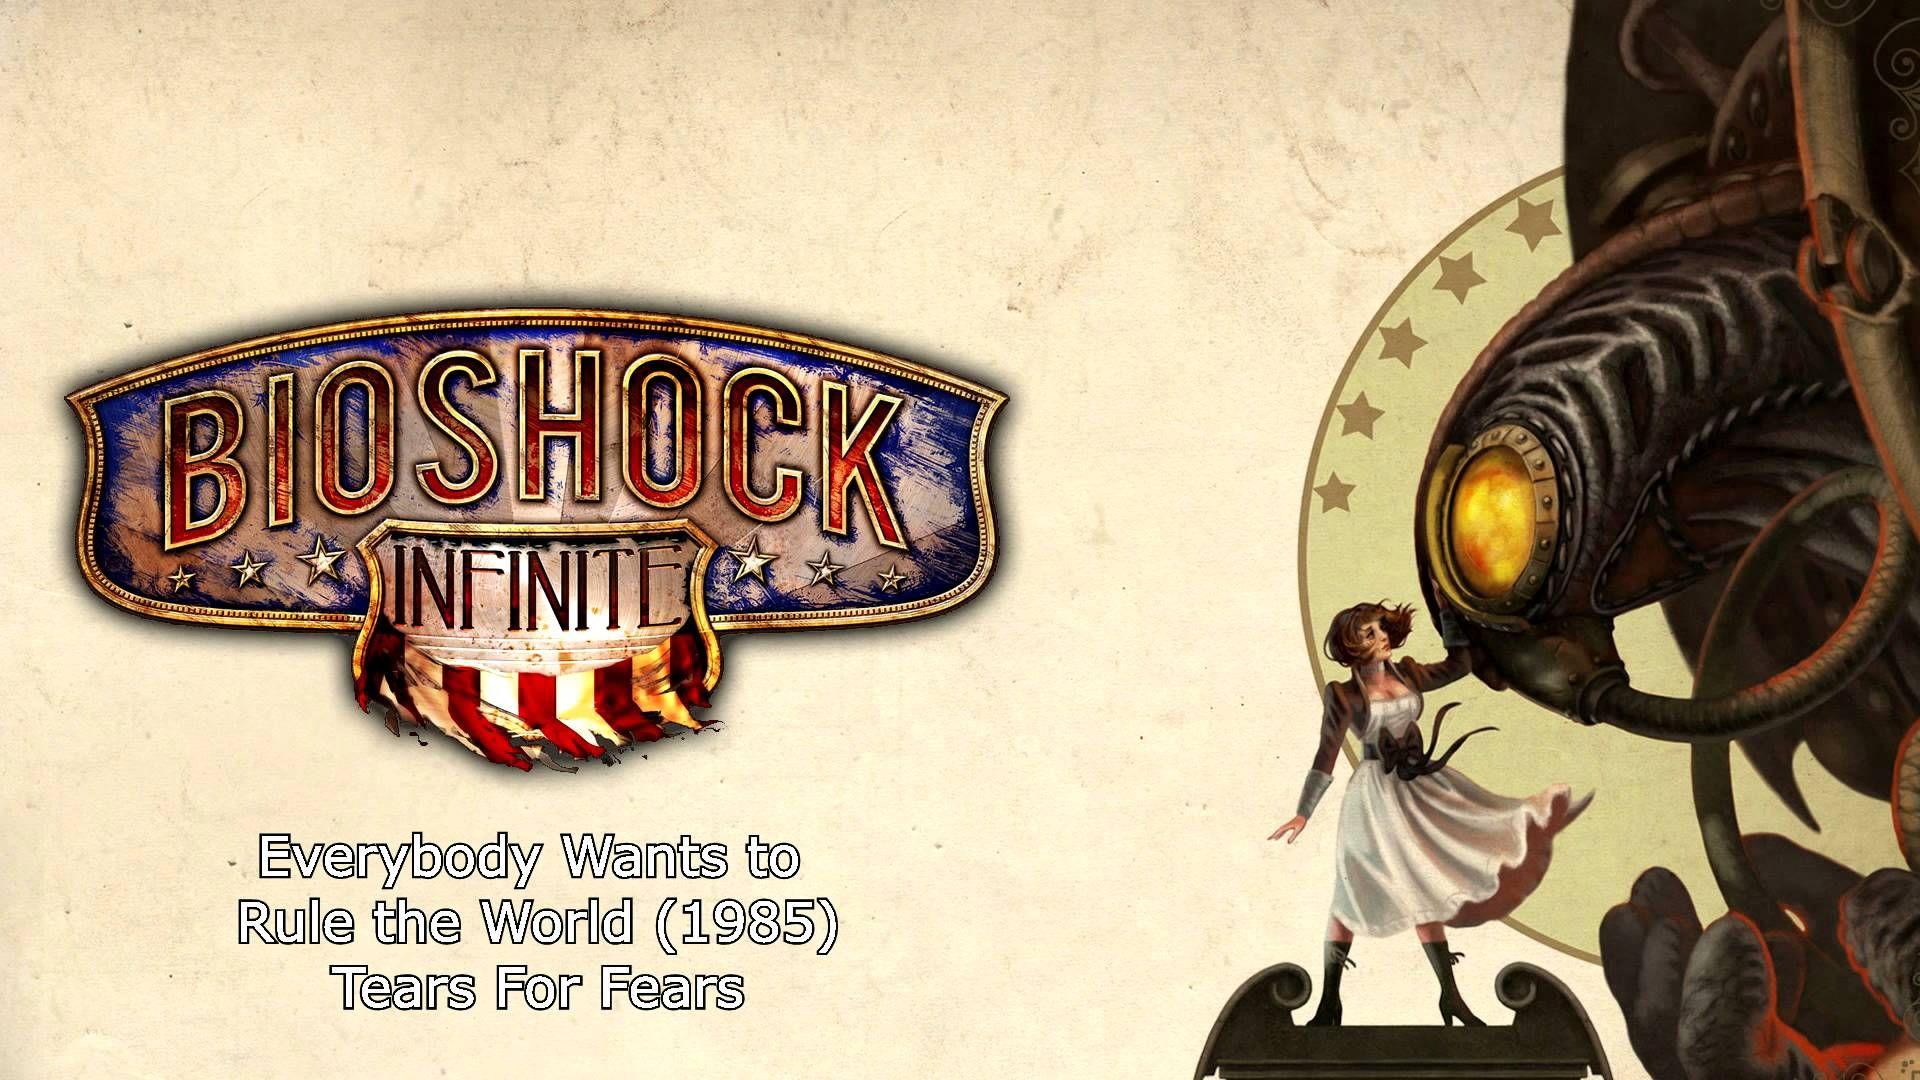 Bioshock soundtrack download